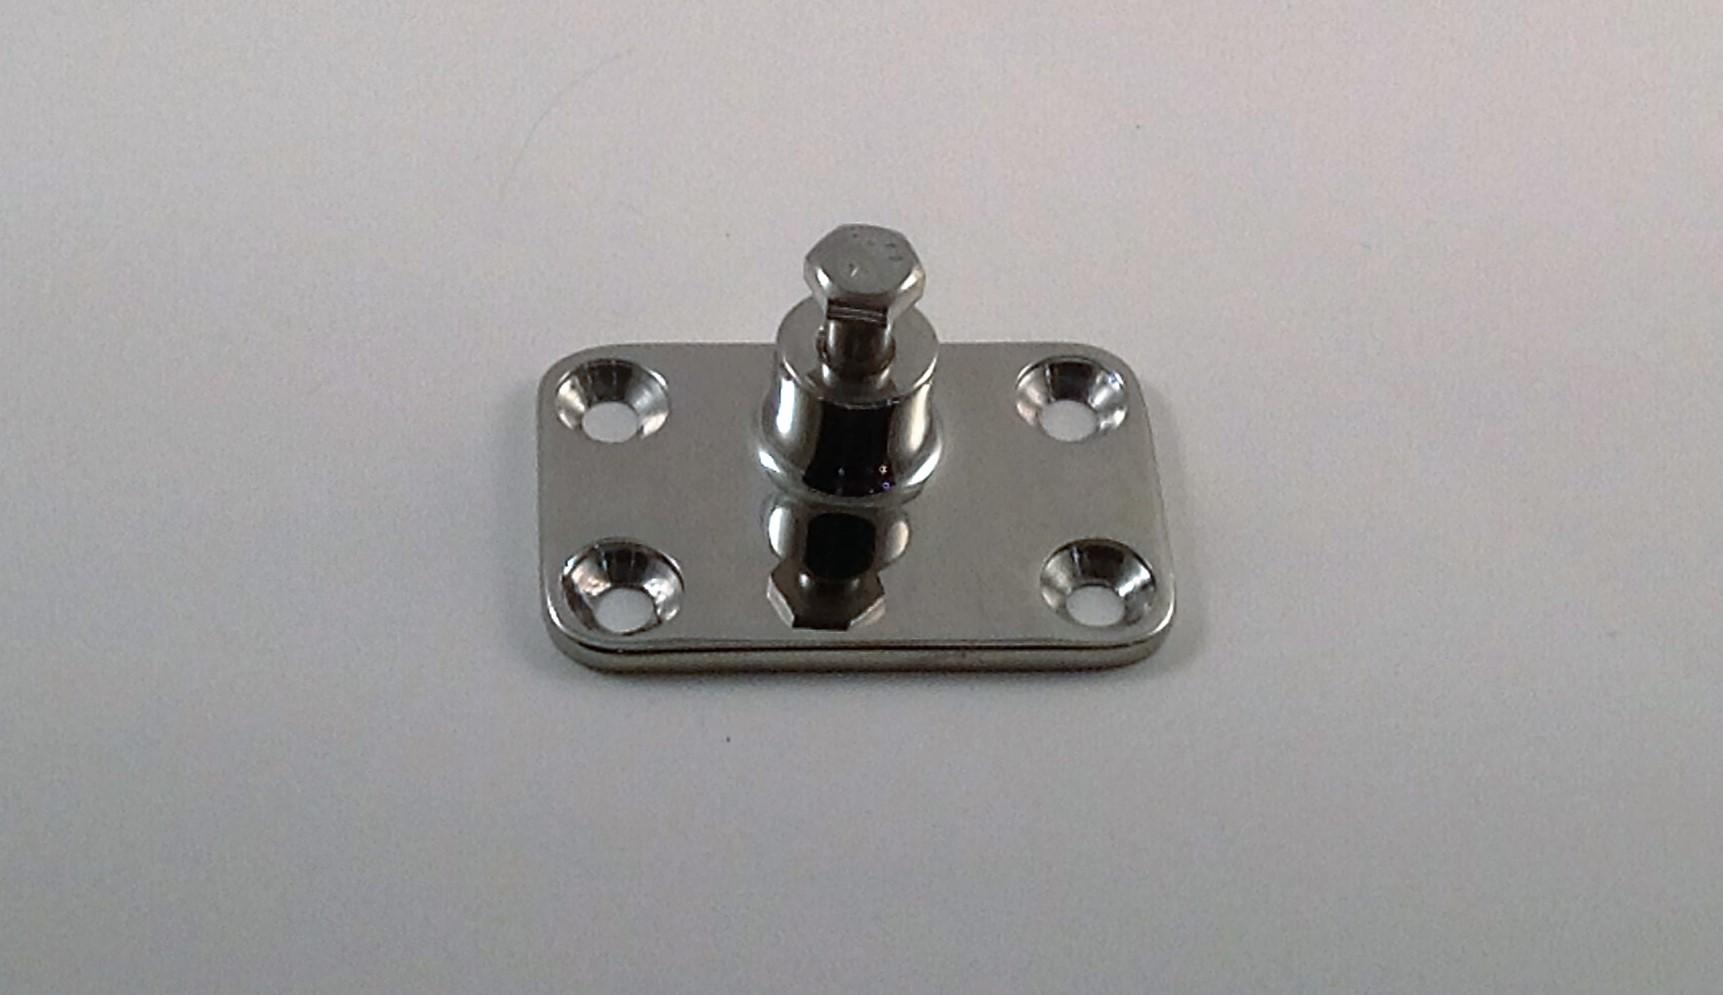 Bimini Top Side  Mount Deck Plate (4 hole)